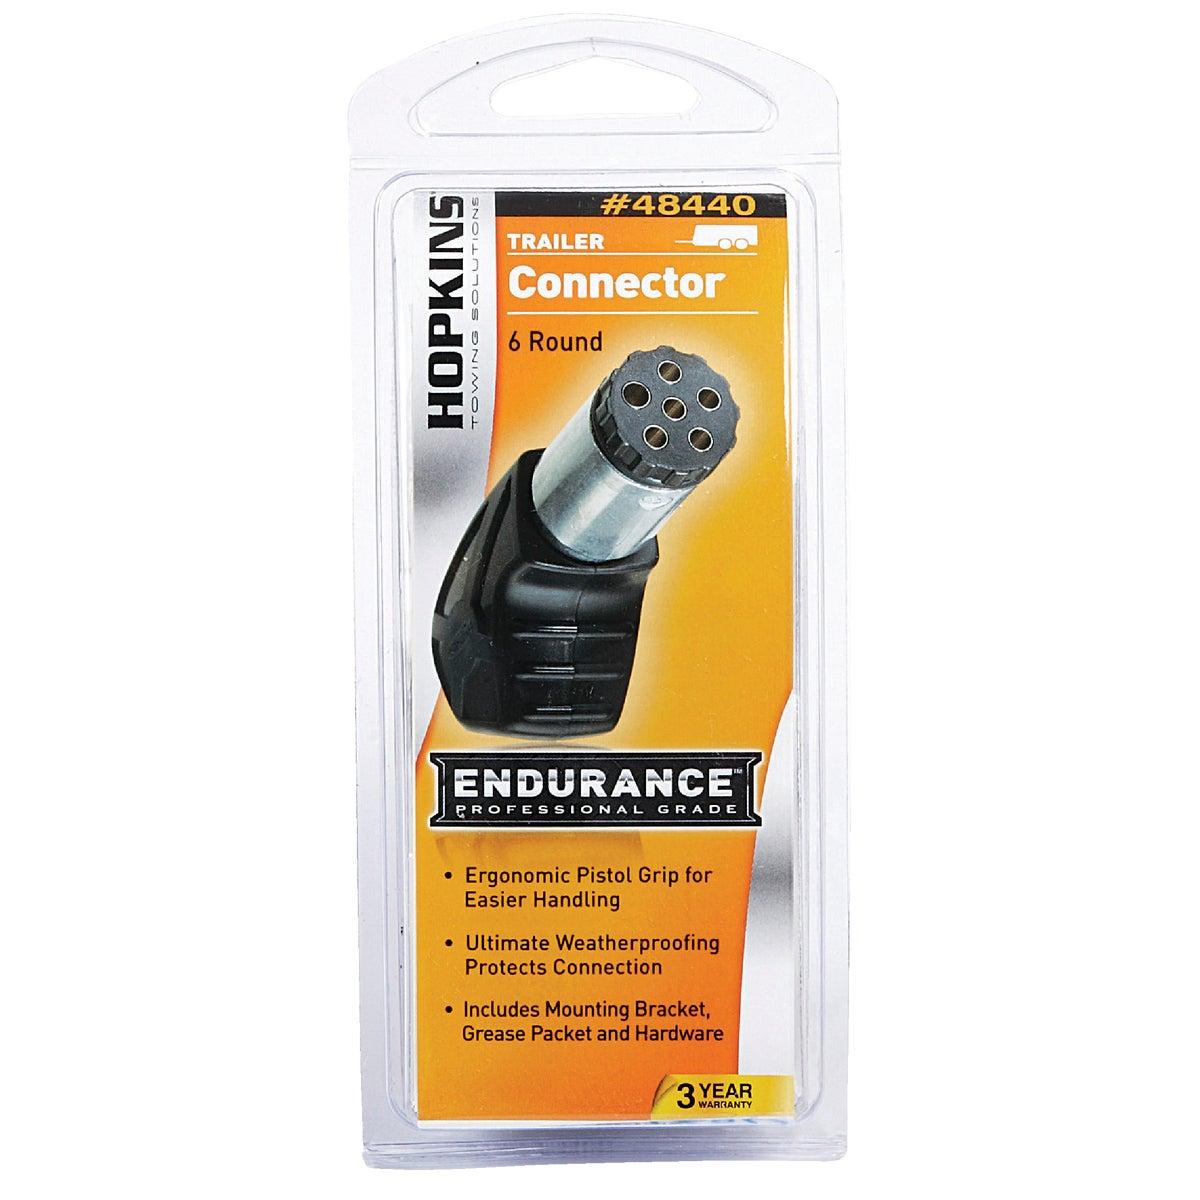 Endurance 6 Round Trailer Side Connector